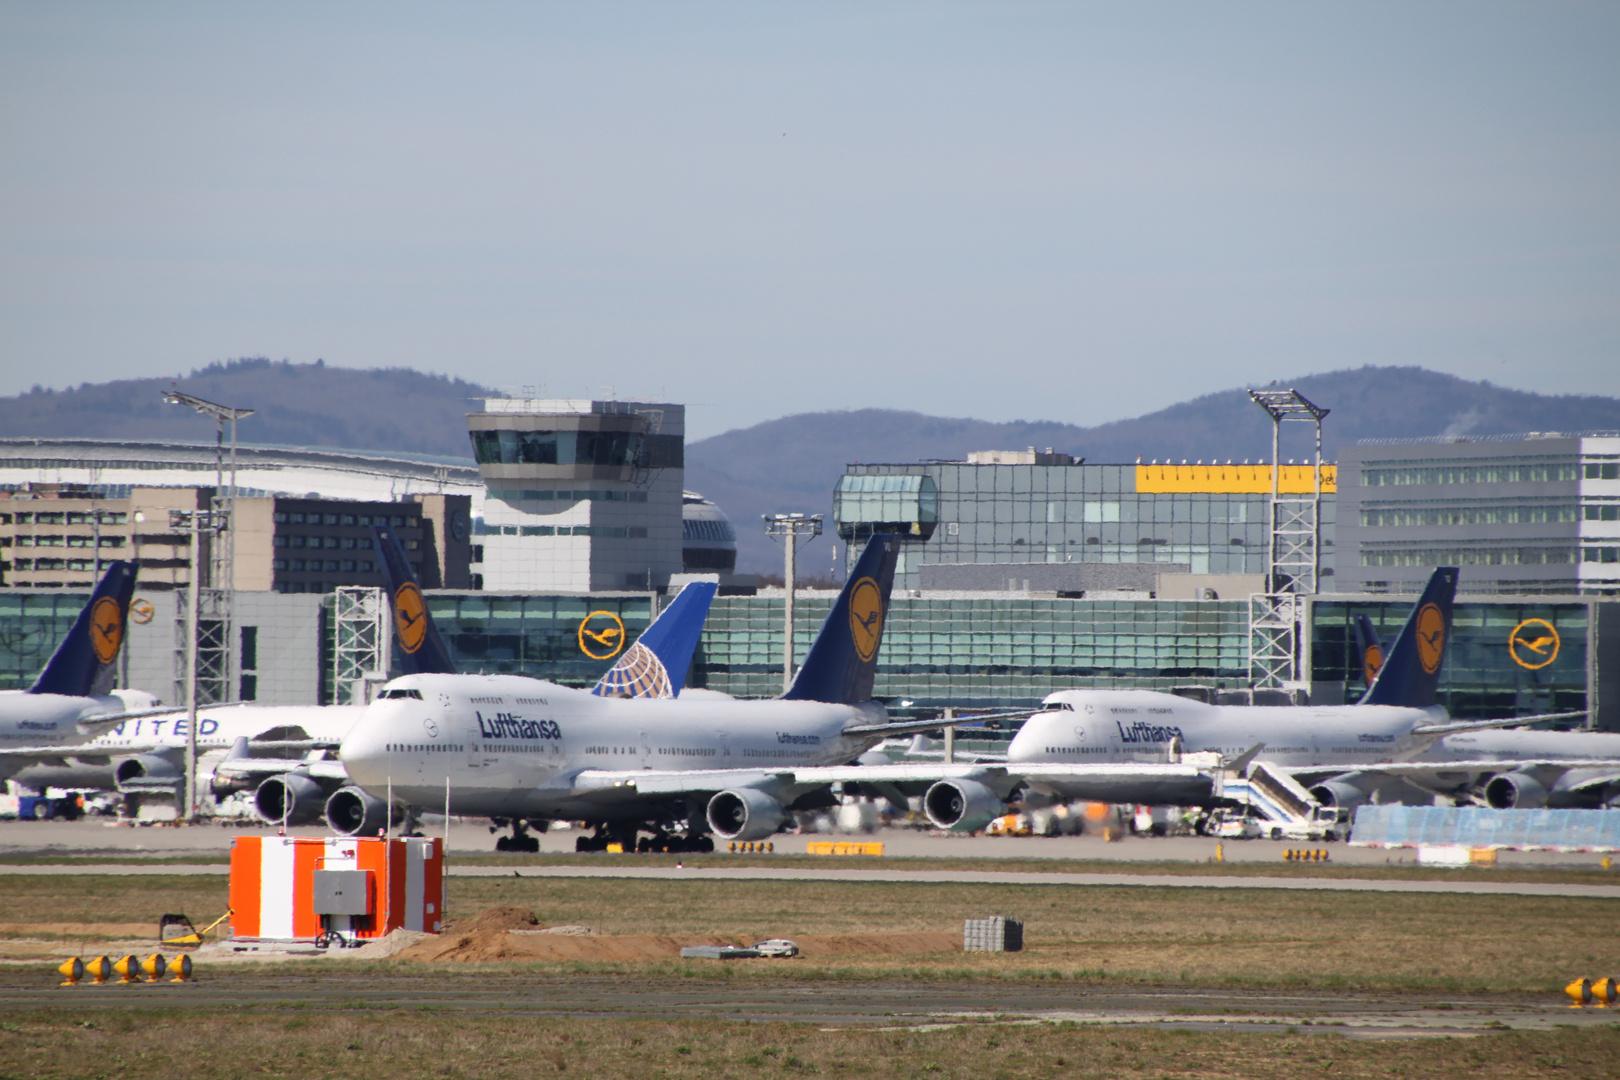 Lufthansa Meeting